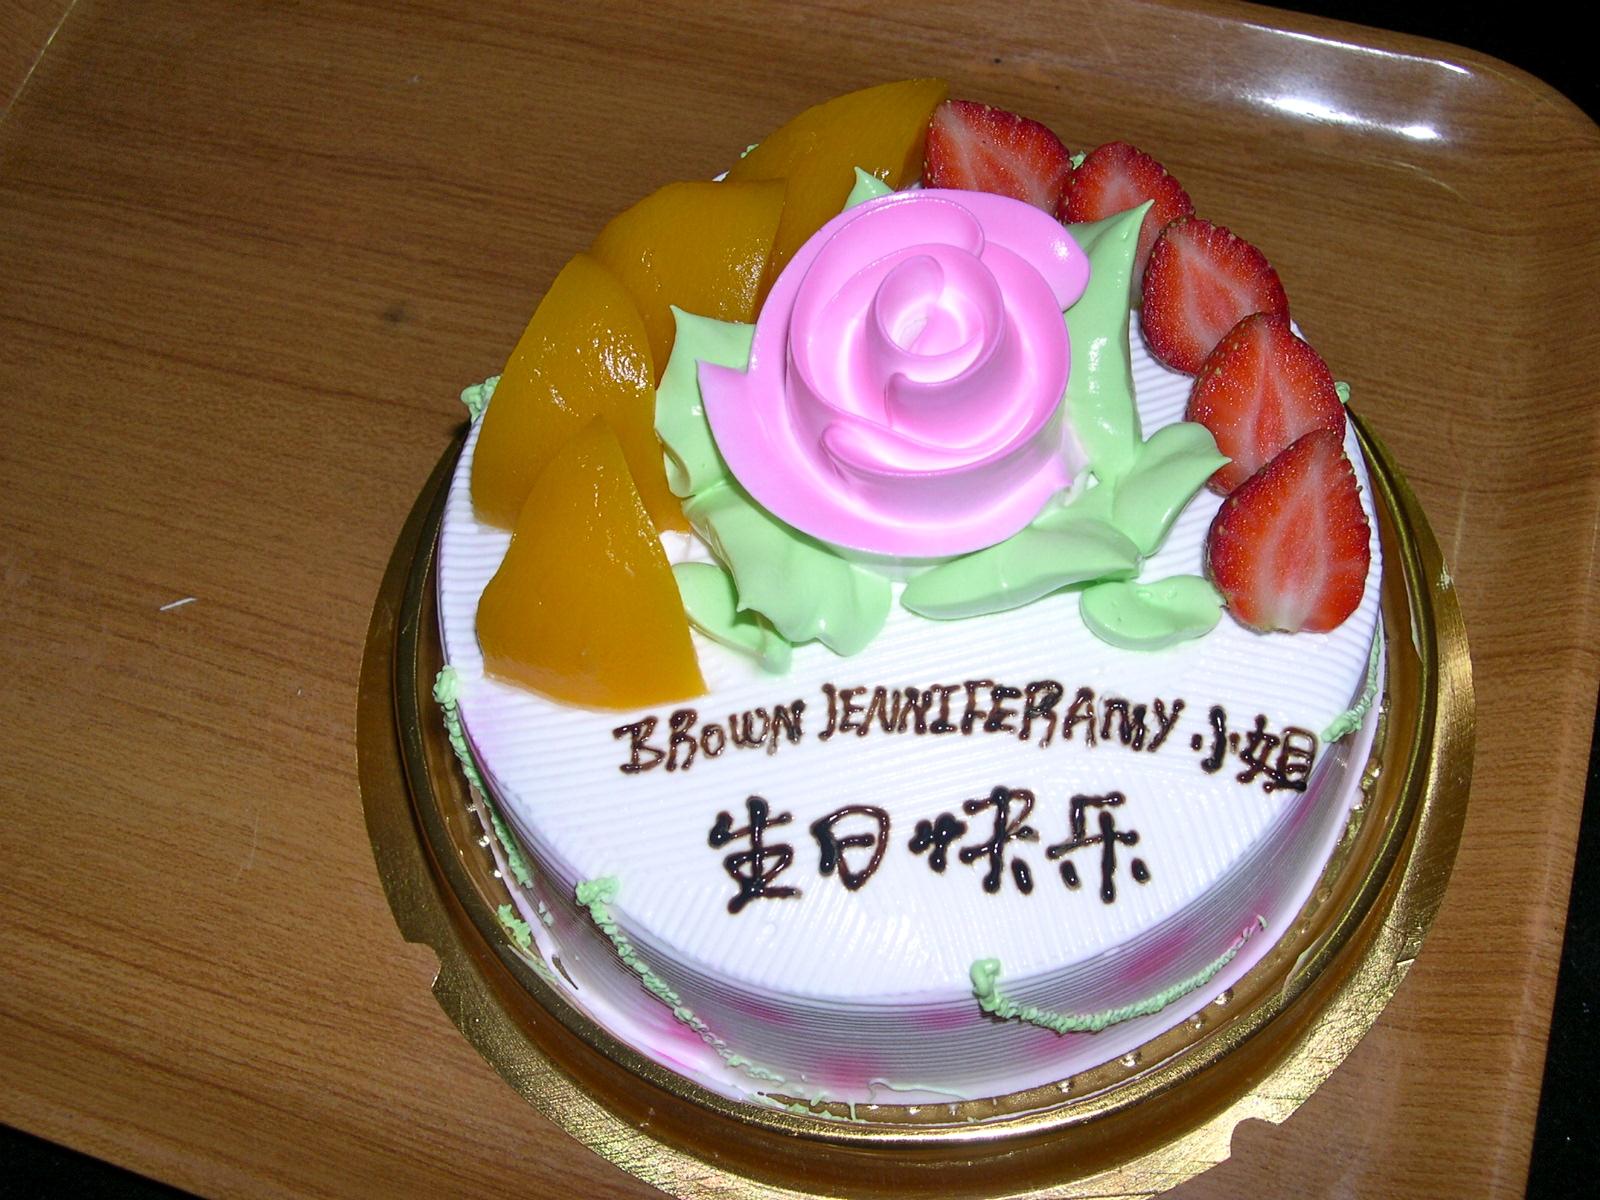 Birthdays Abroad Expat Lingo